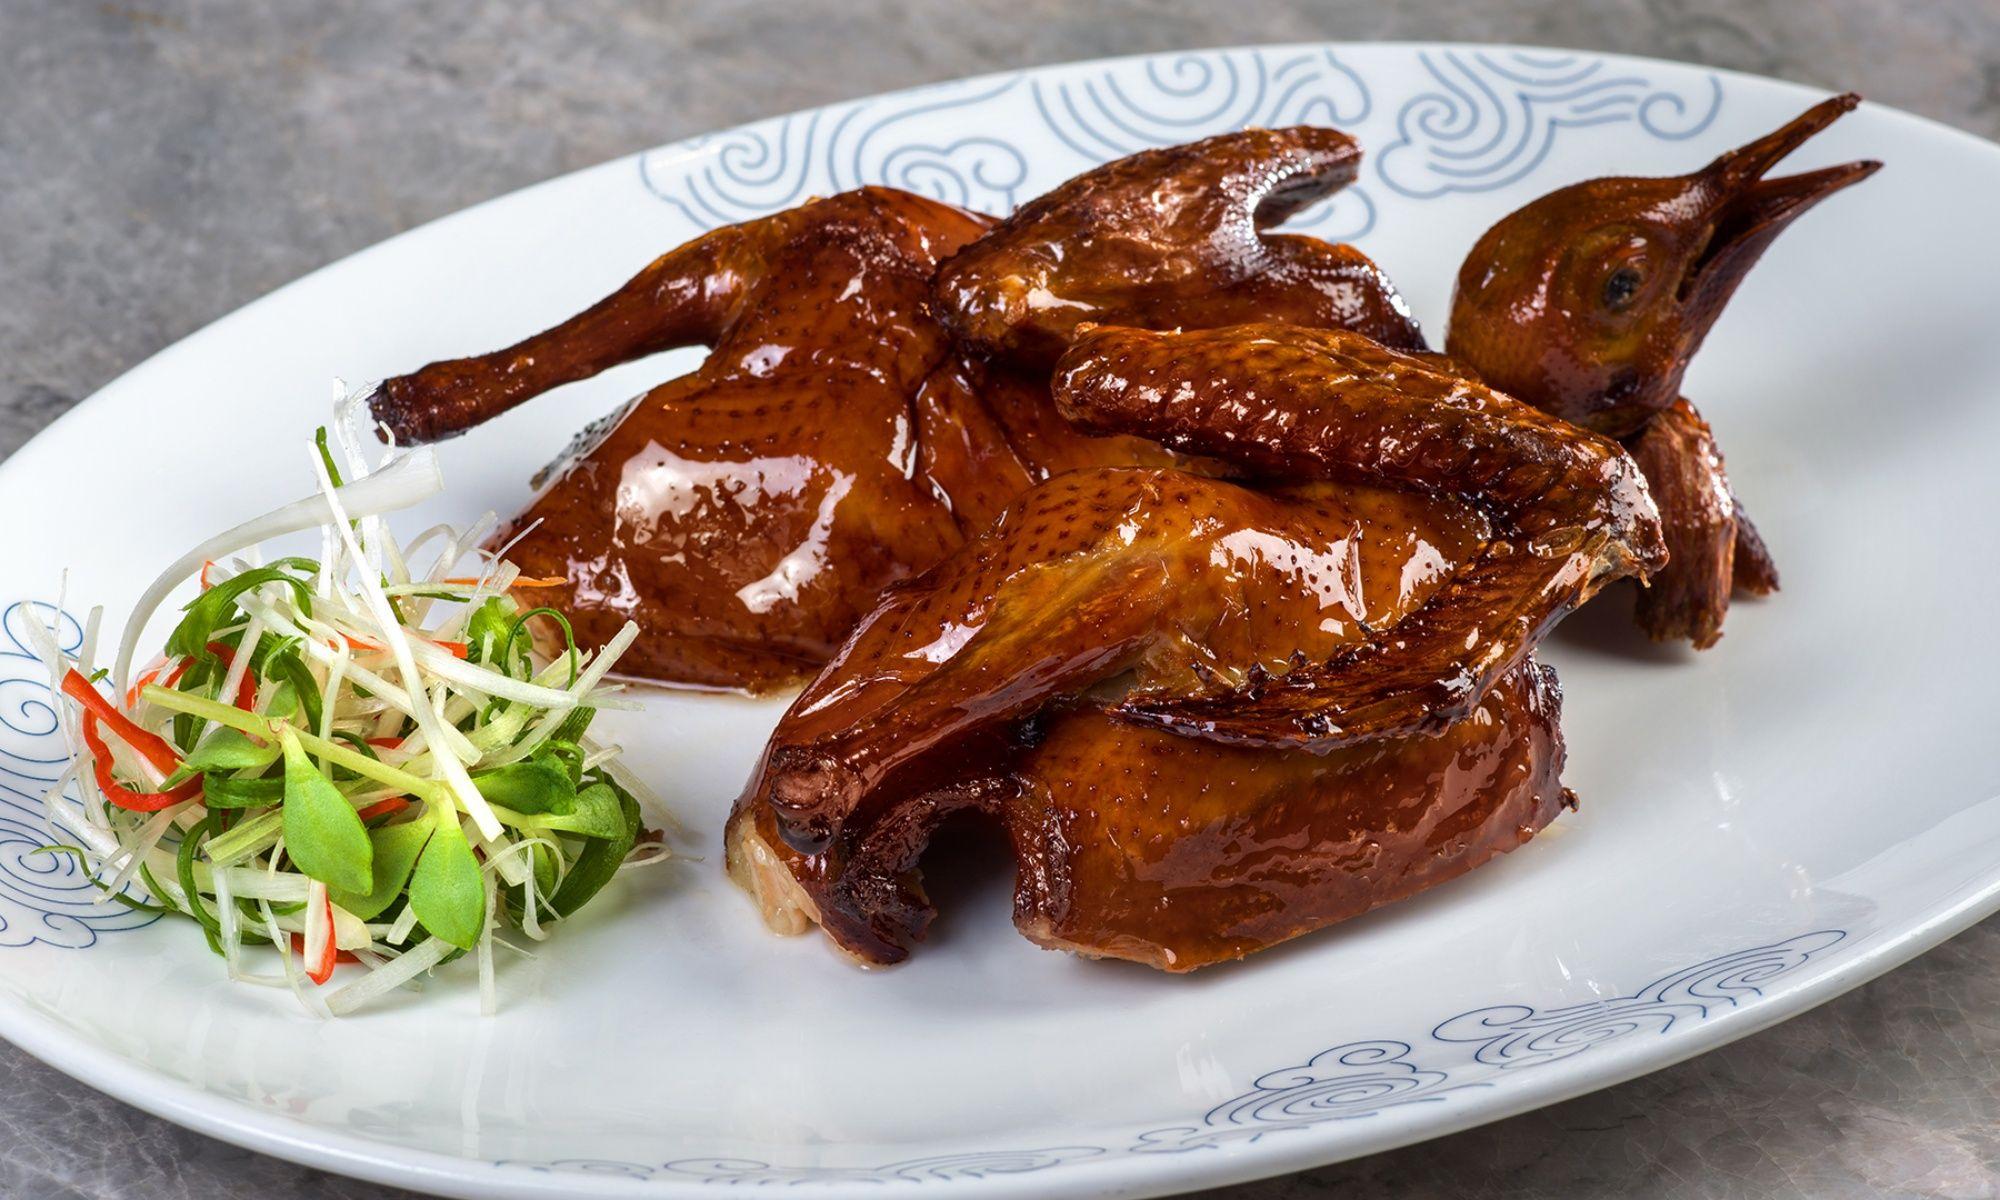 Summer Delights Feast at 10 Shanghai